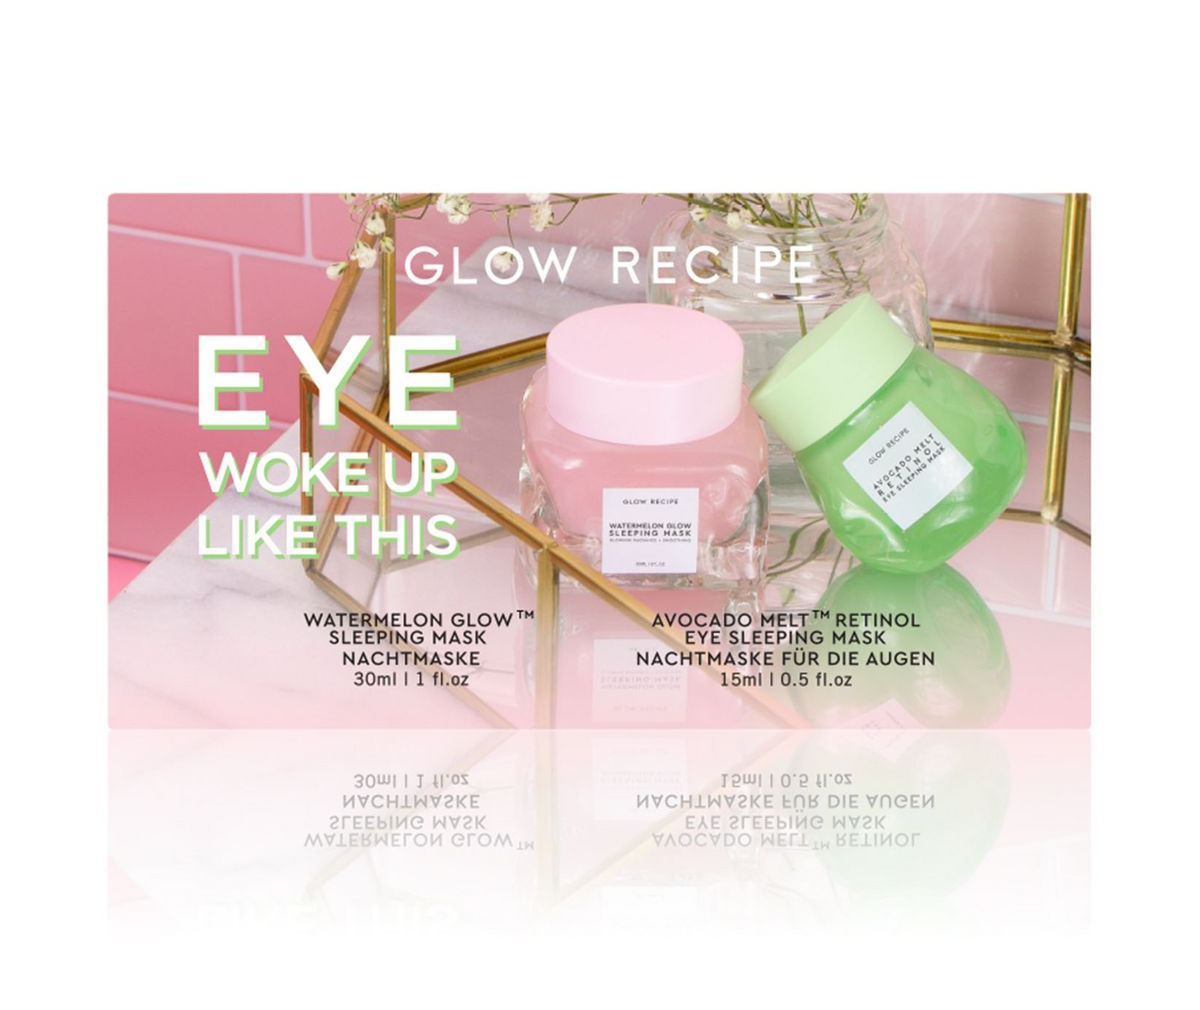 Glow Recipe Eye Woke Up Like This Set